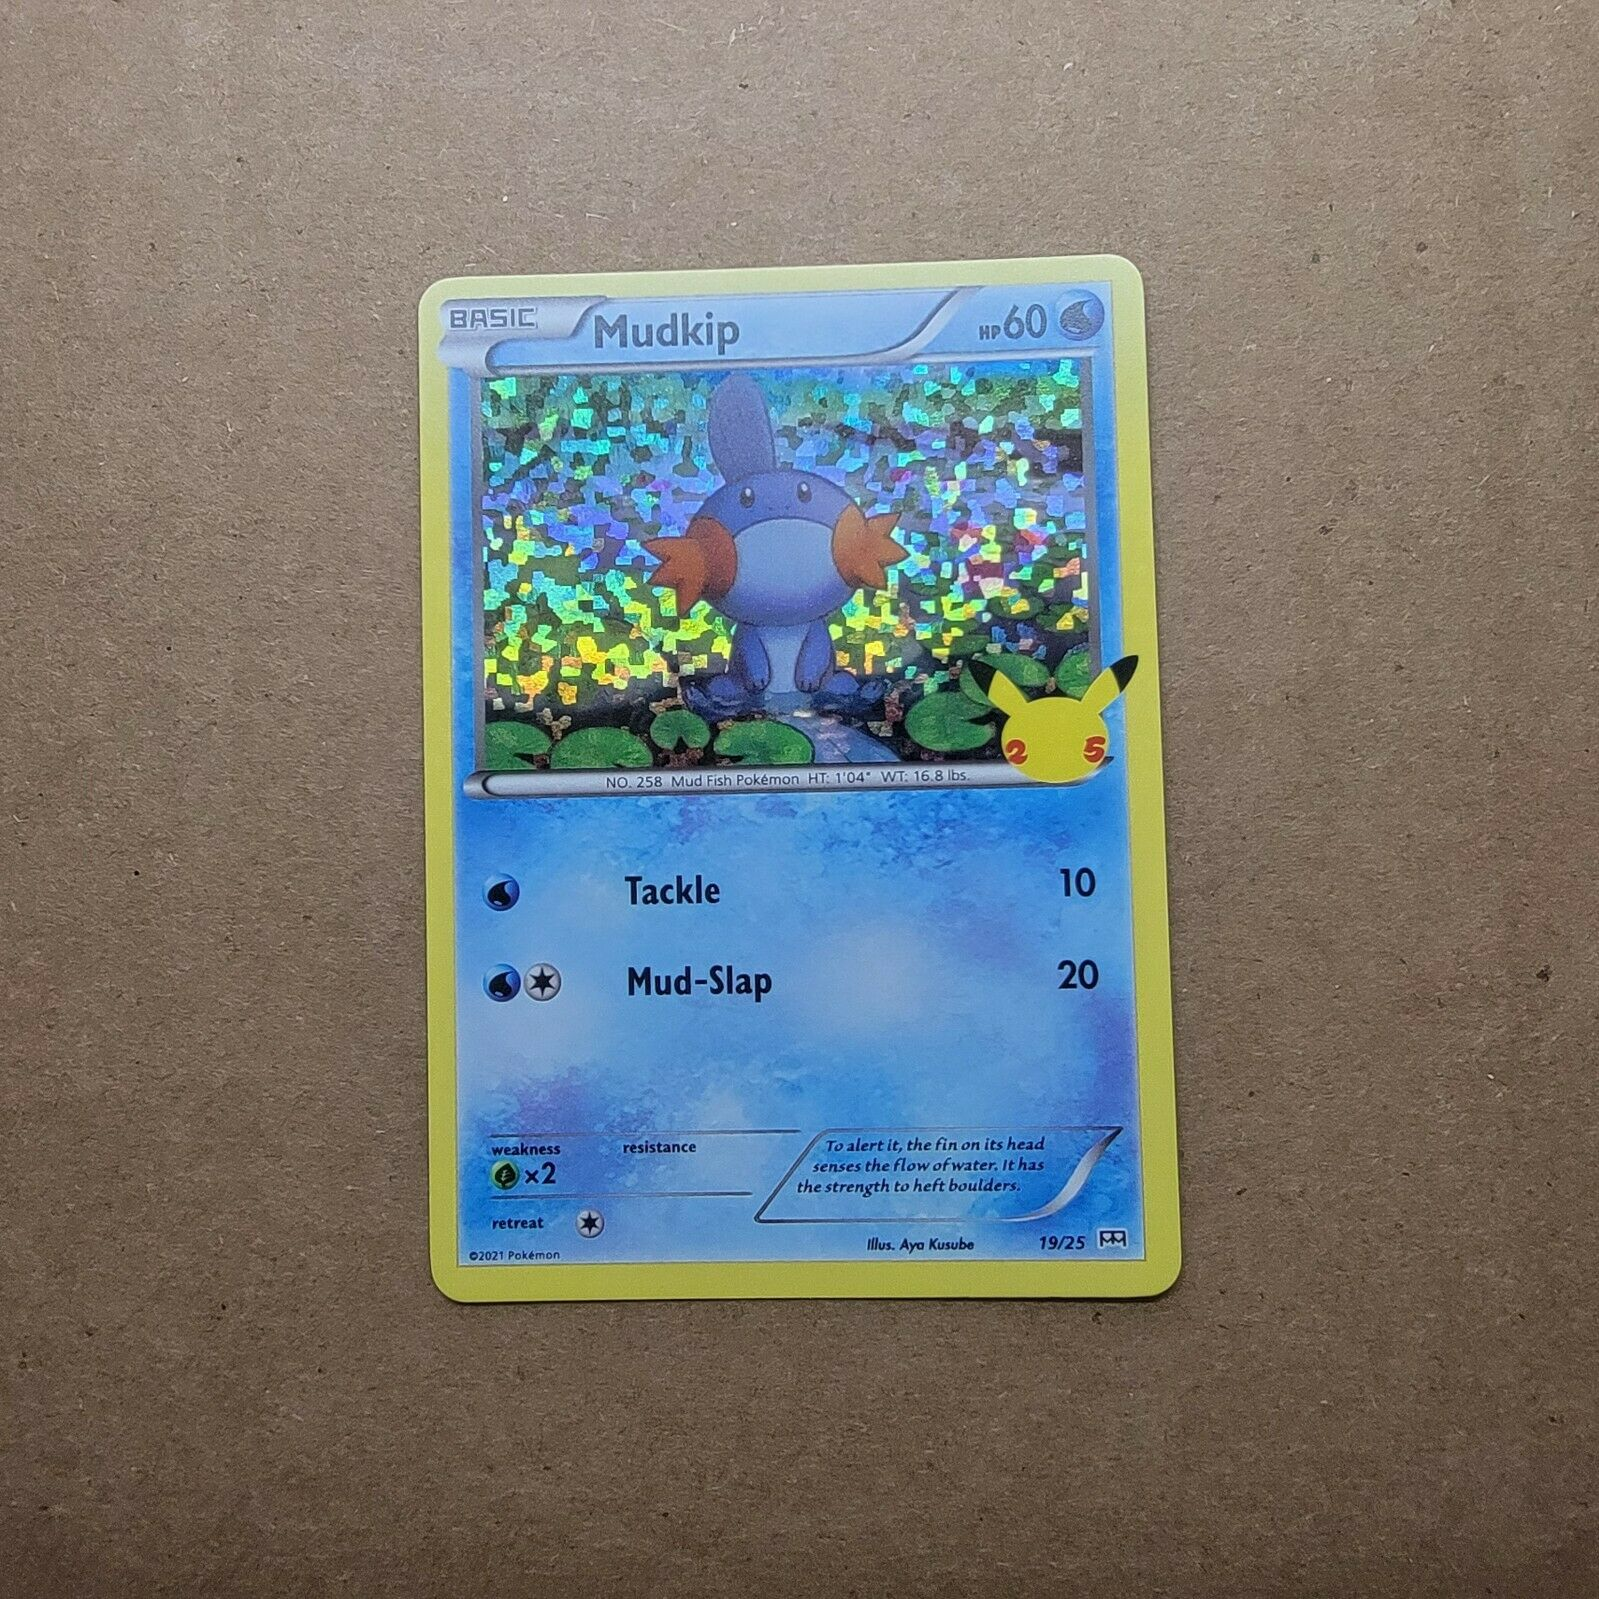 McDonald's 25th Anniversary Pokemon Holographic Mudkip Card Promo 2021 19/25